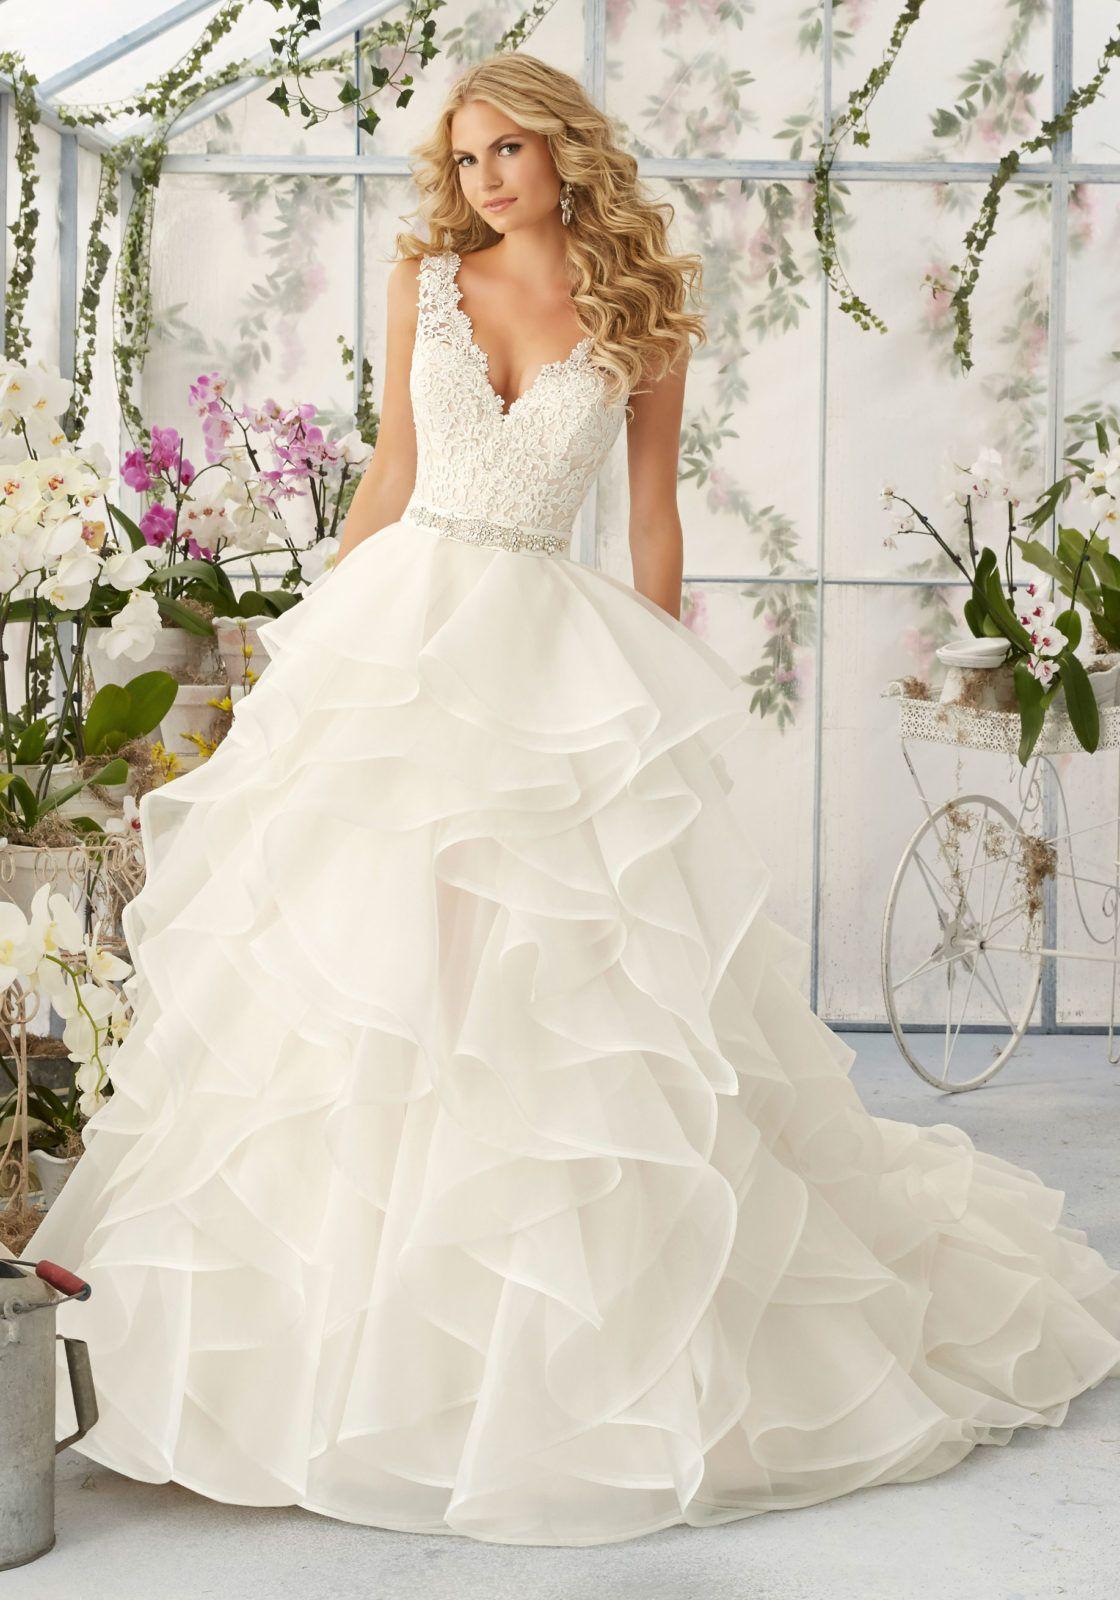 ca807353808f27 Lace and Organza Morilee Bridal Wedding Dress Organza Trouwjurkne